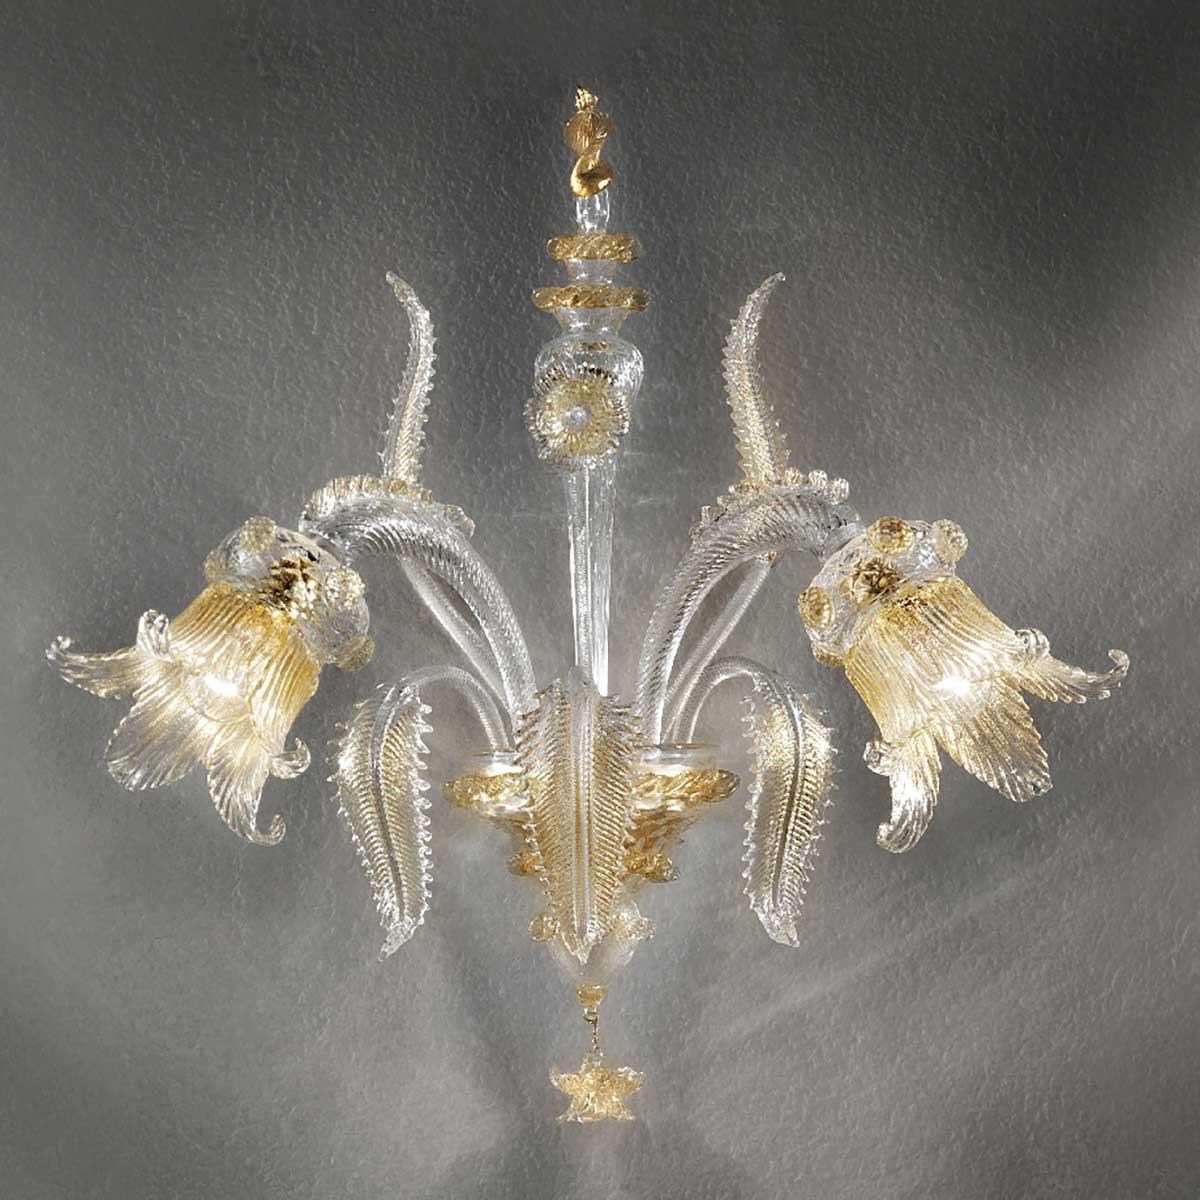 Fenice 2 flammig aus Murano glas wandleuchte - transparente Gold farbe